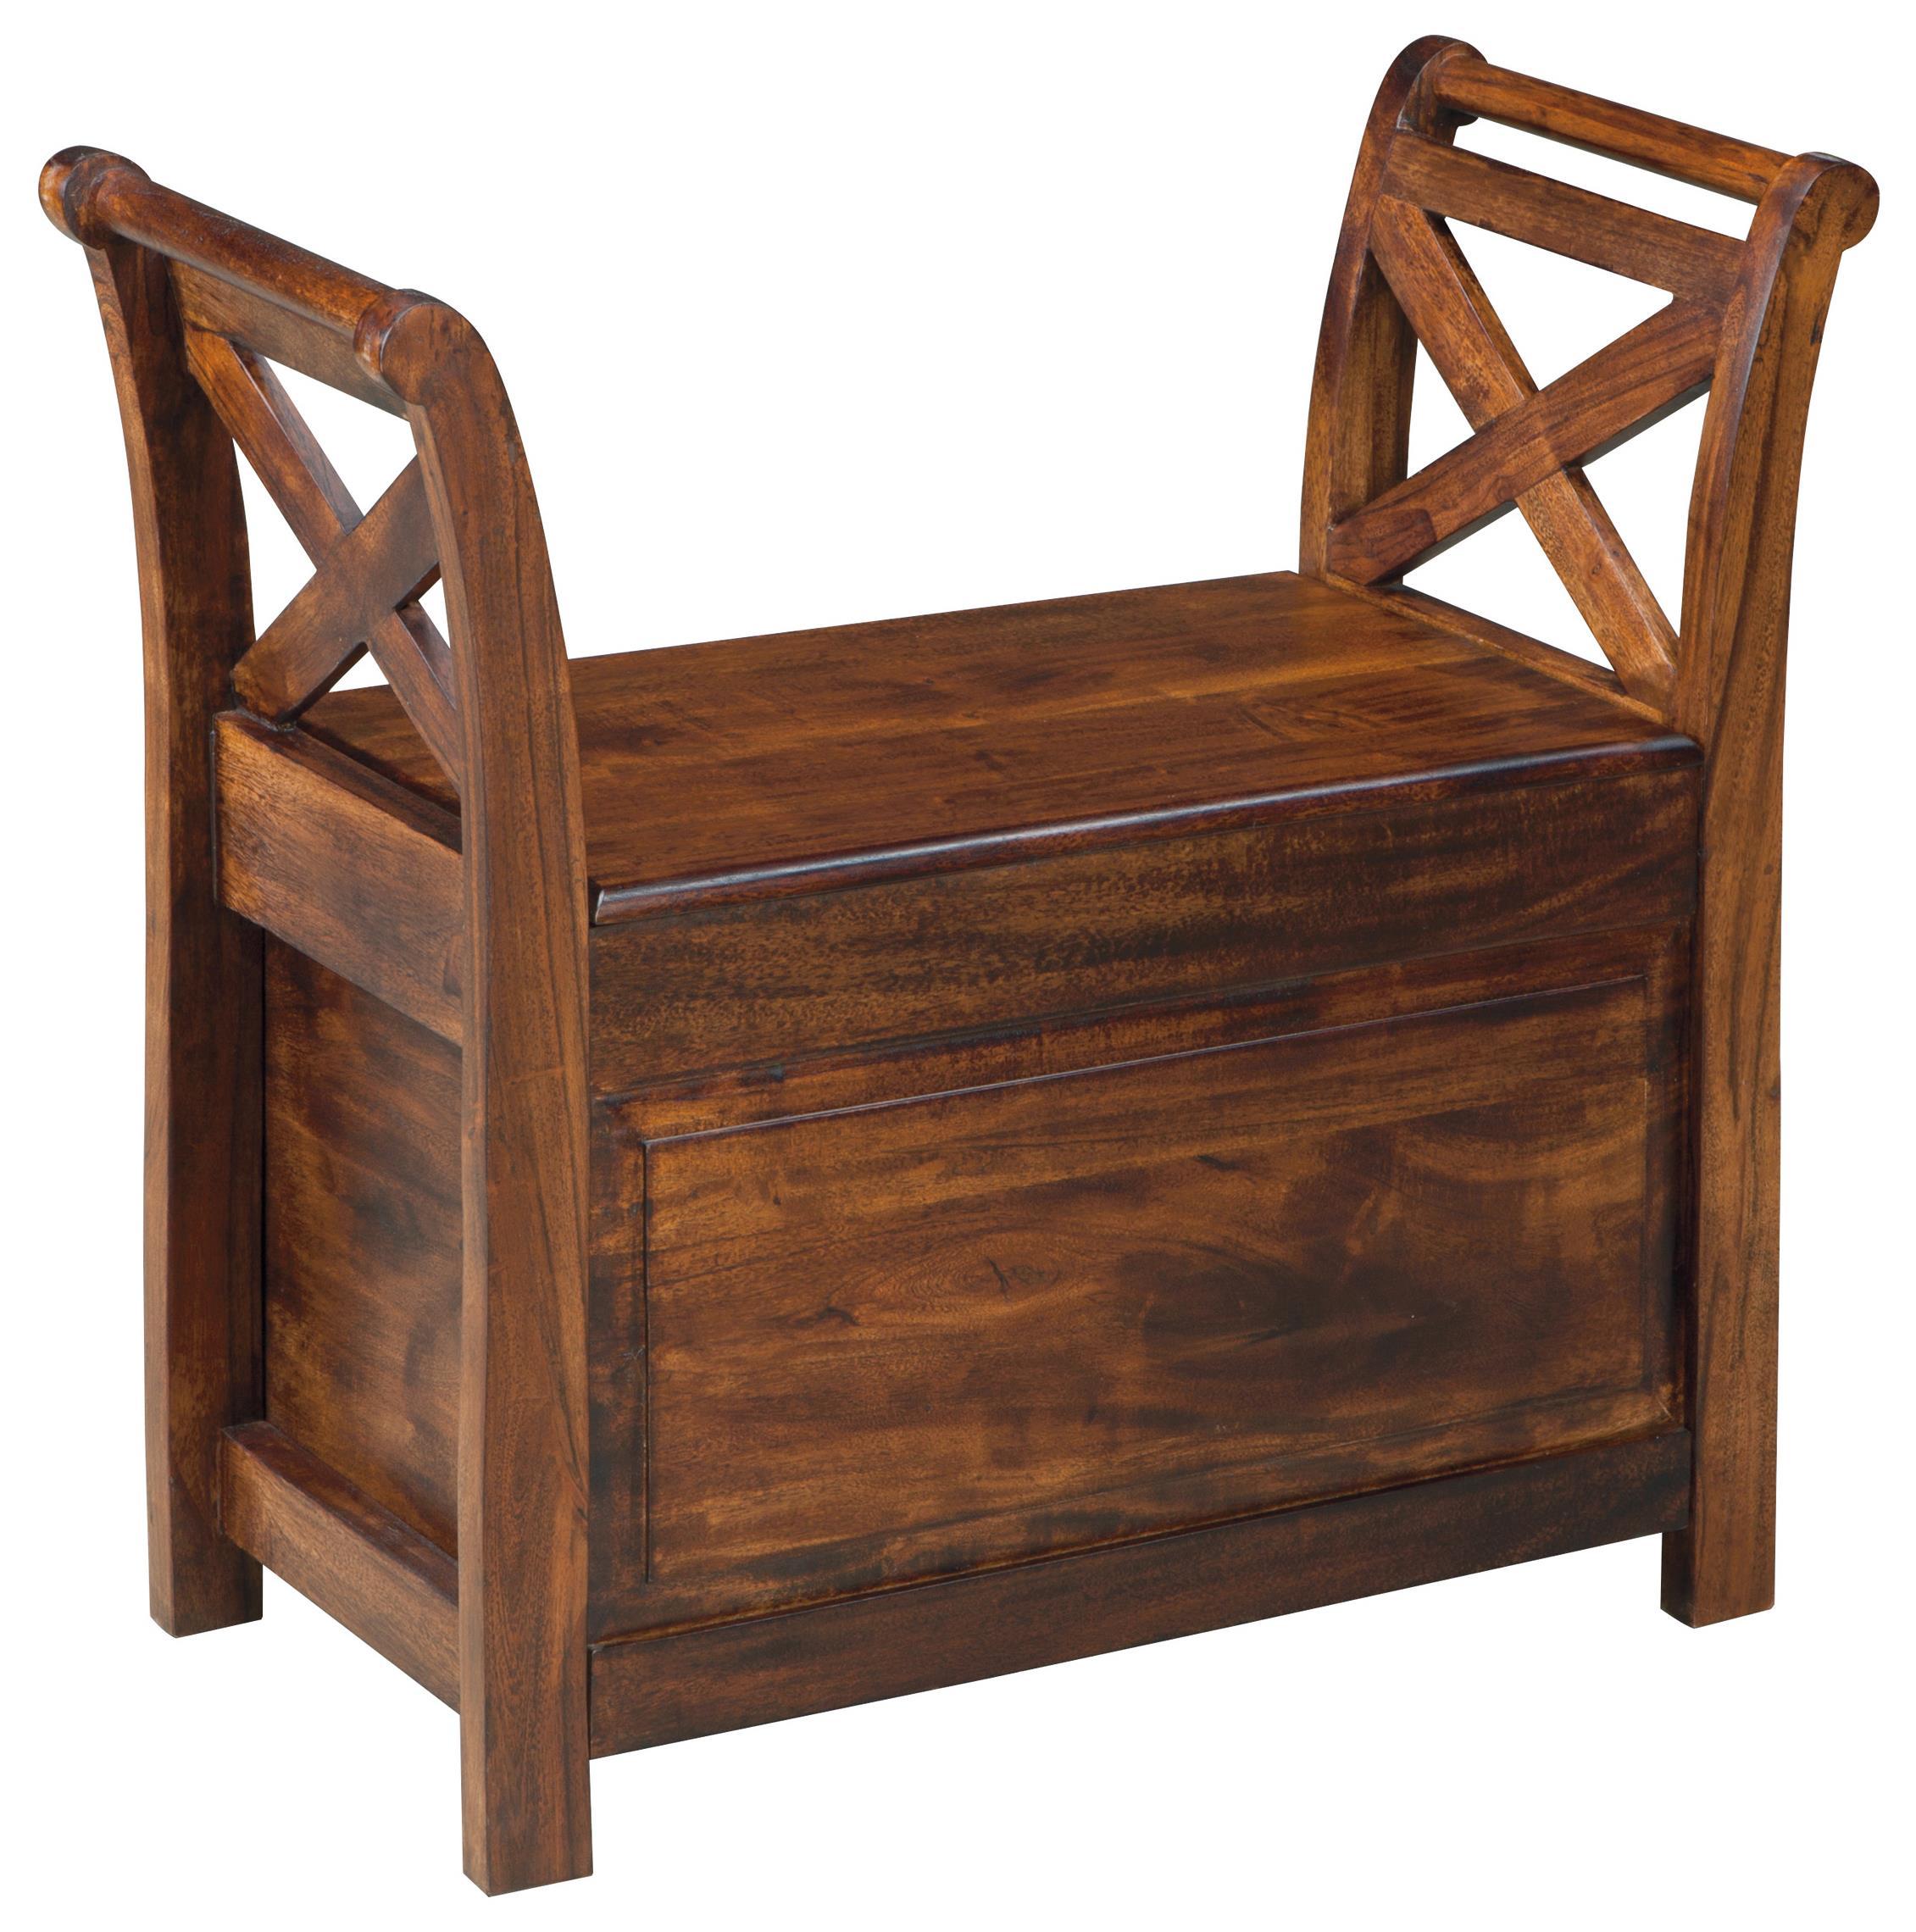 Signature Design By Ashley Abbonto Mango Wood Bench With Storage